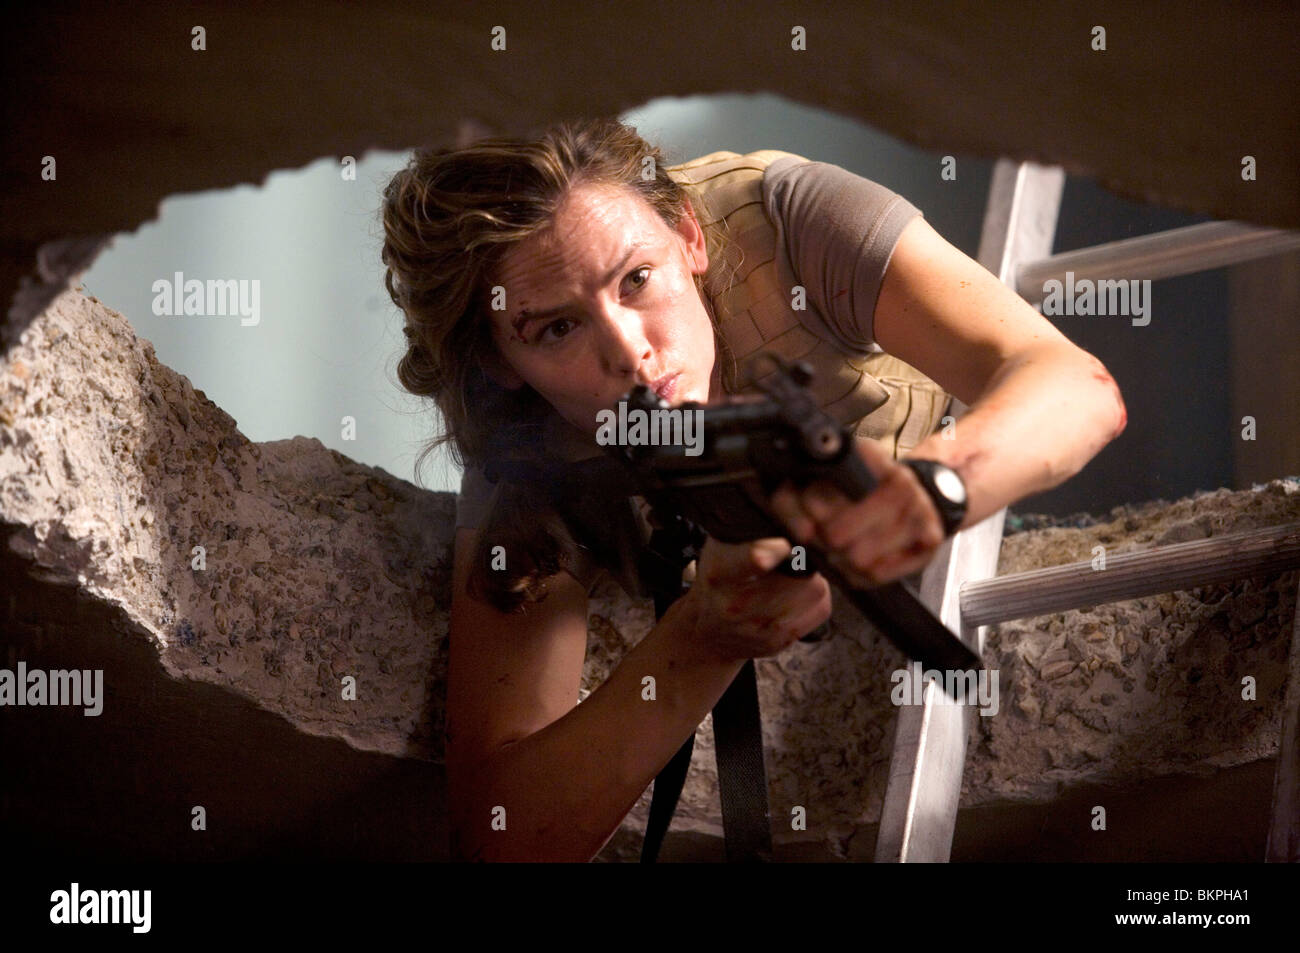 Il Regno (2007) JANET MAYES, Ali Suliman, Jamie Foxx, Chris Cooper PETER BERG (DIR) TKIN 006 Immagini Stock